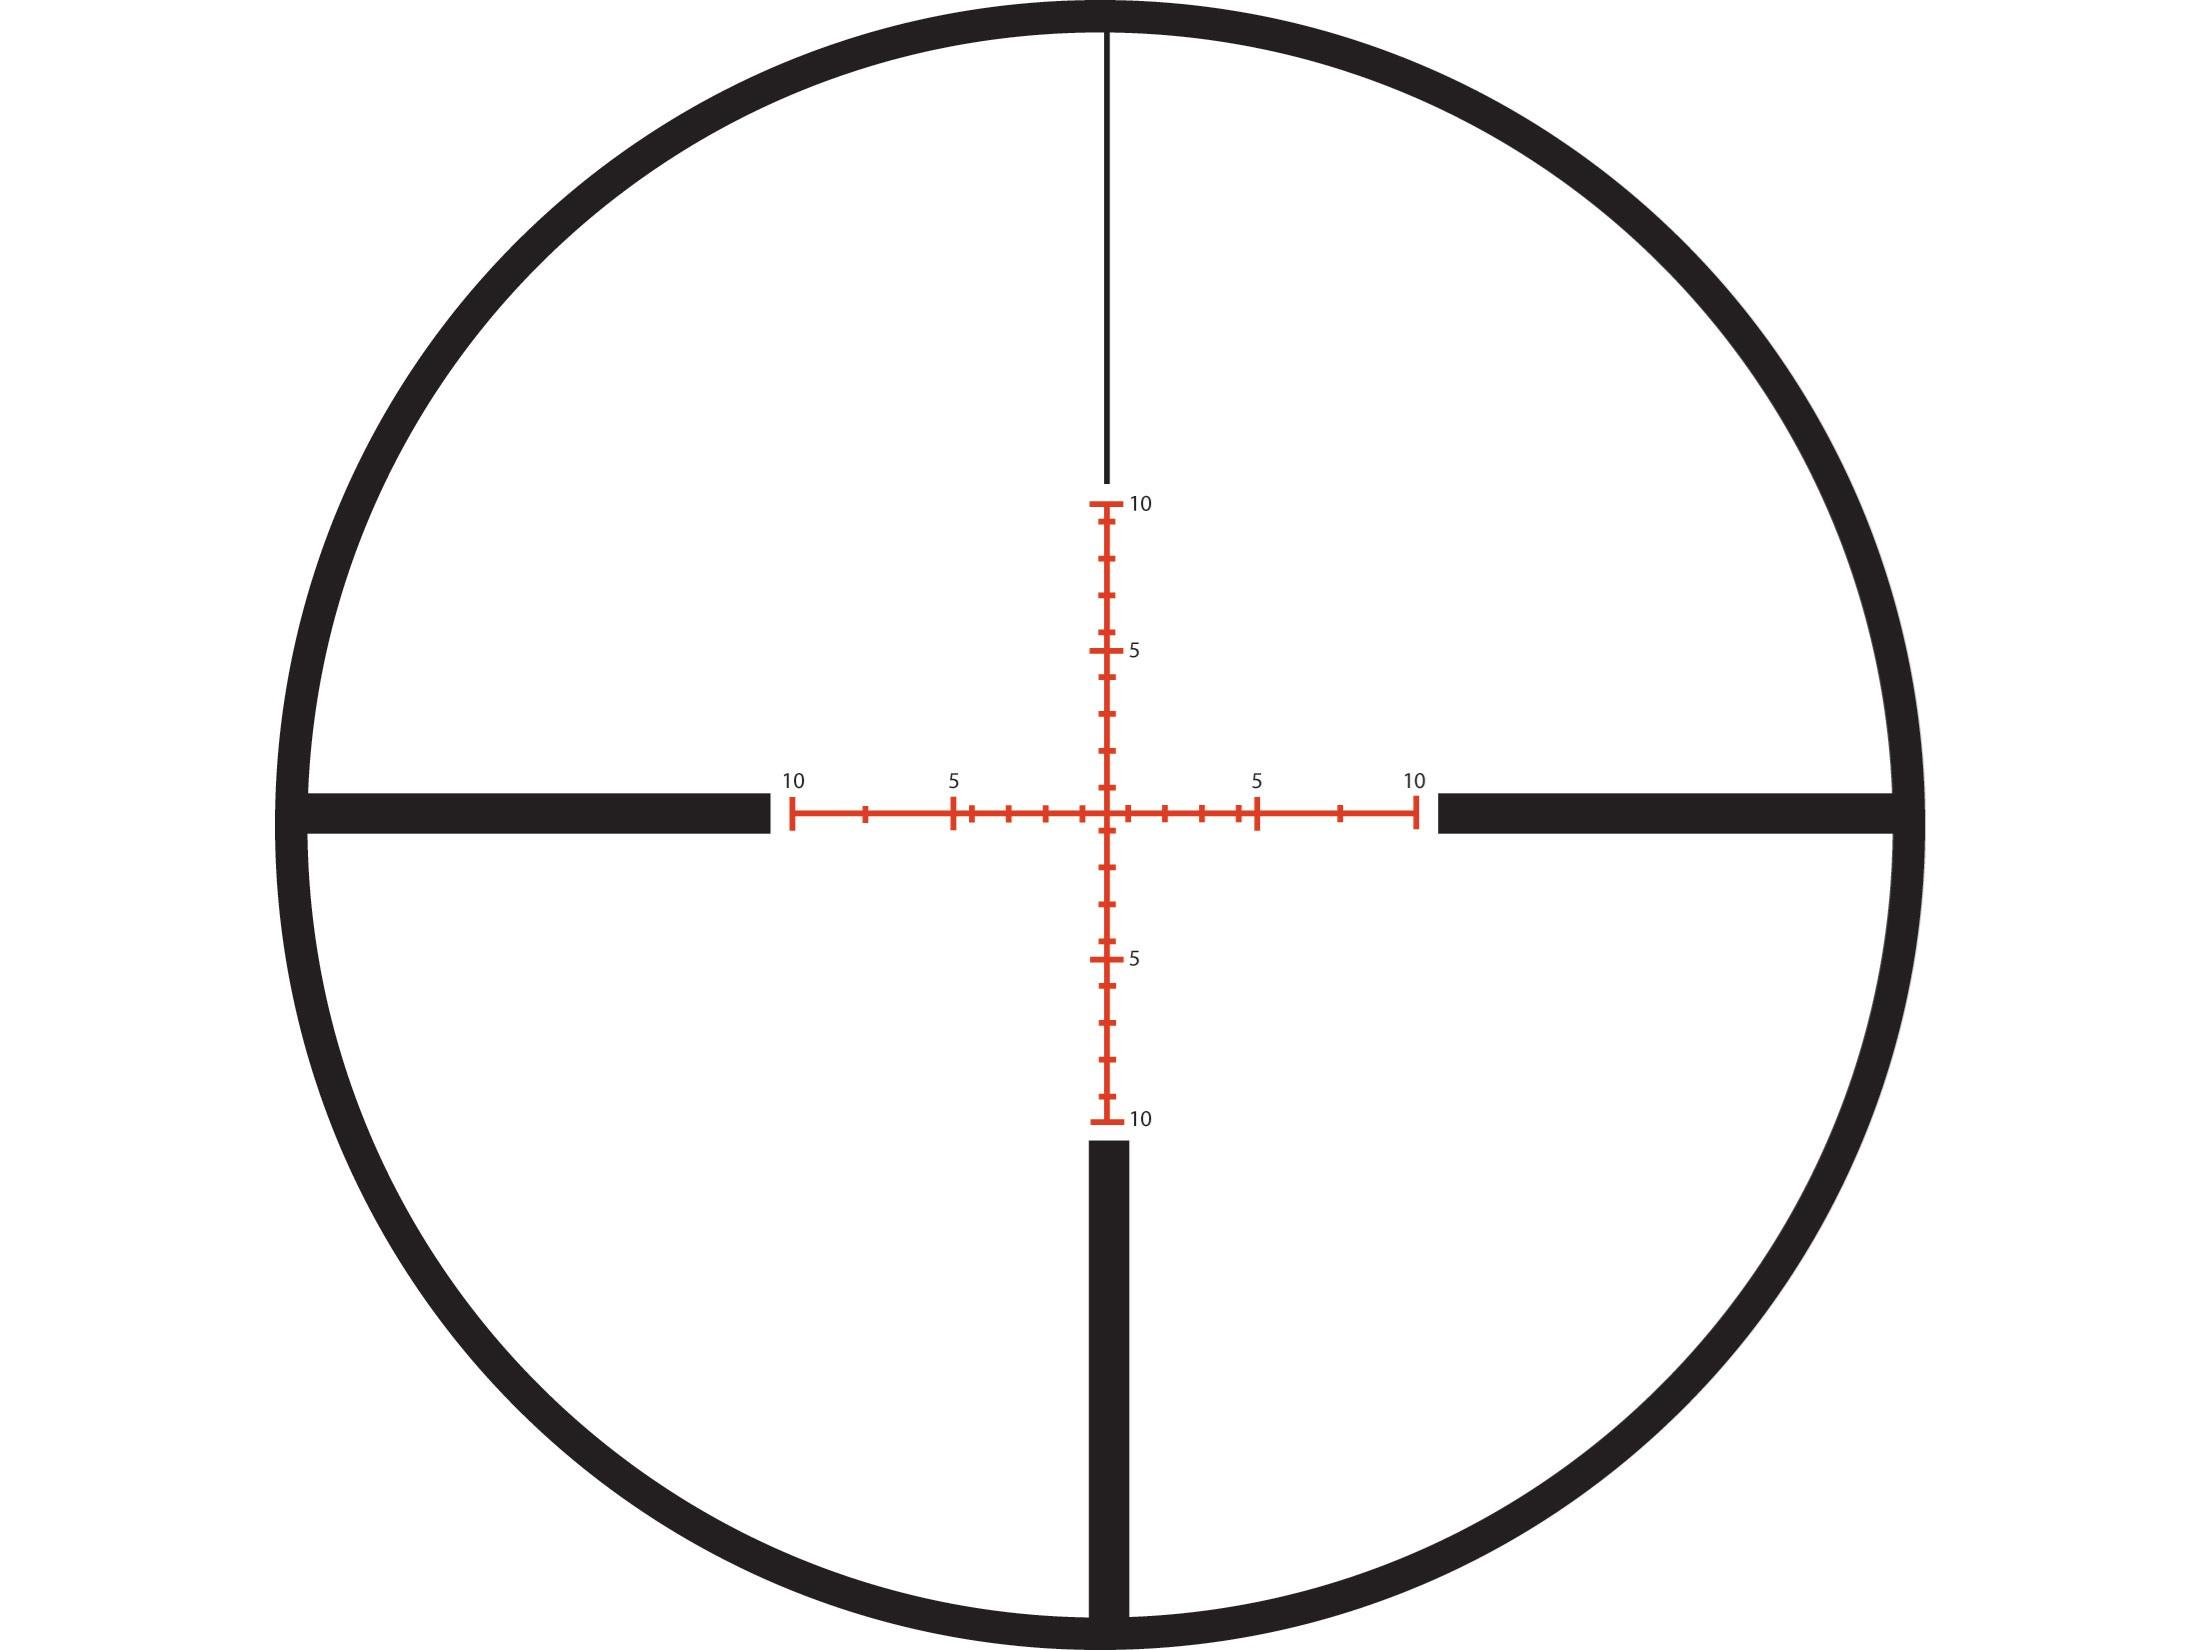 Vortex Razor Hd Rifle Scope 35mm Tube 5 20x 50mm Illuminated Ebr 1 Reticle